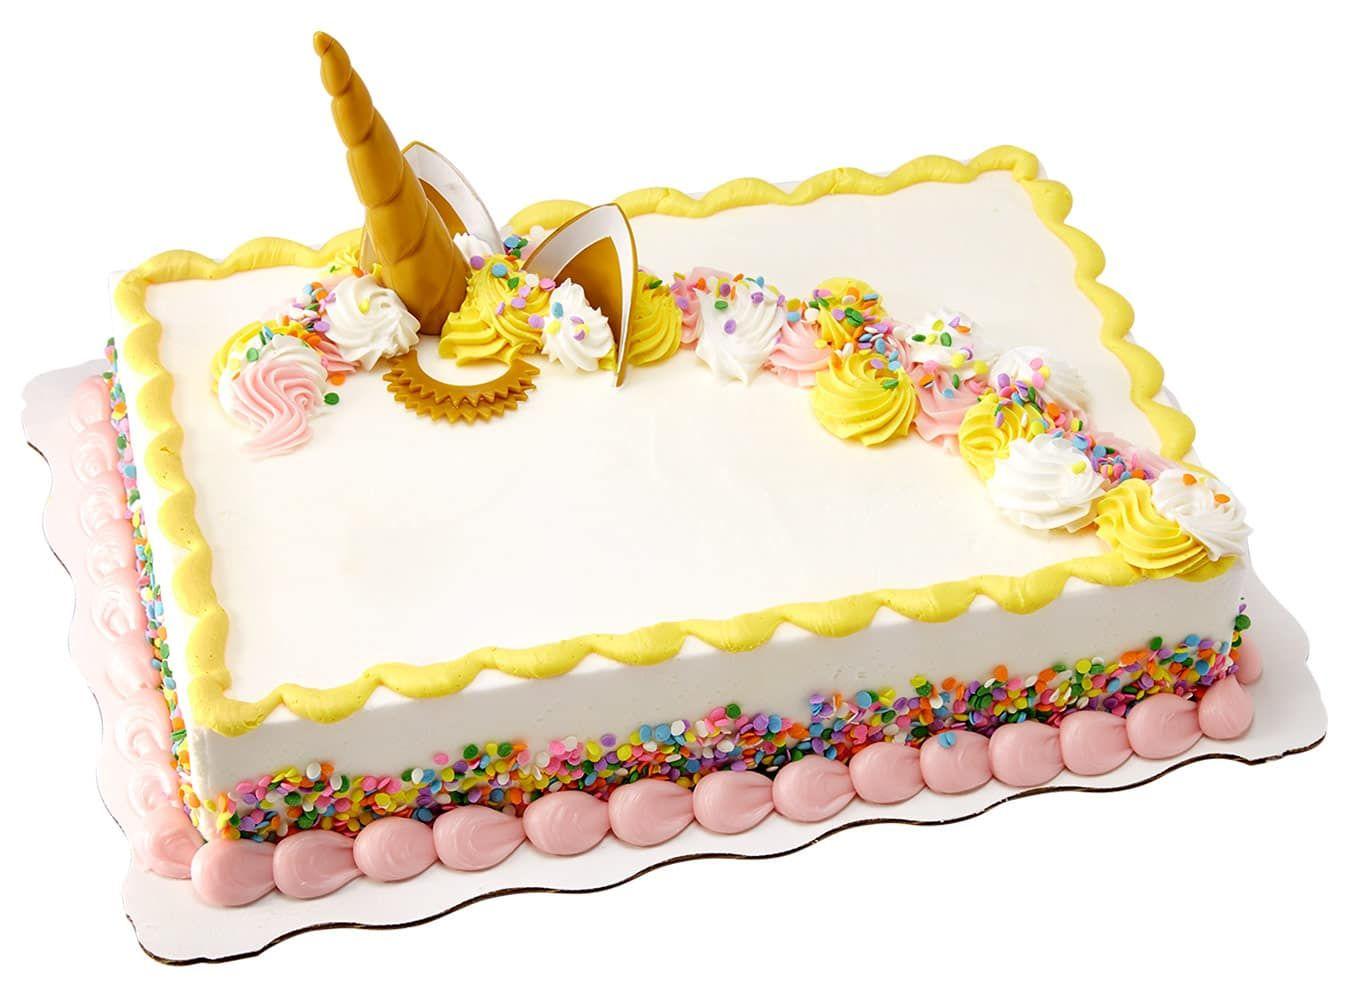 Fabulous Walmart Custom Cakes In 2020 Walmart Custom Cakes Walmart Funny Birthday Cards Online Hetedamsfinfo